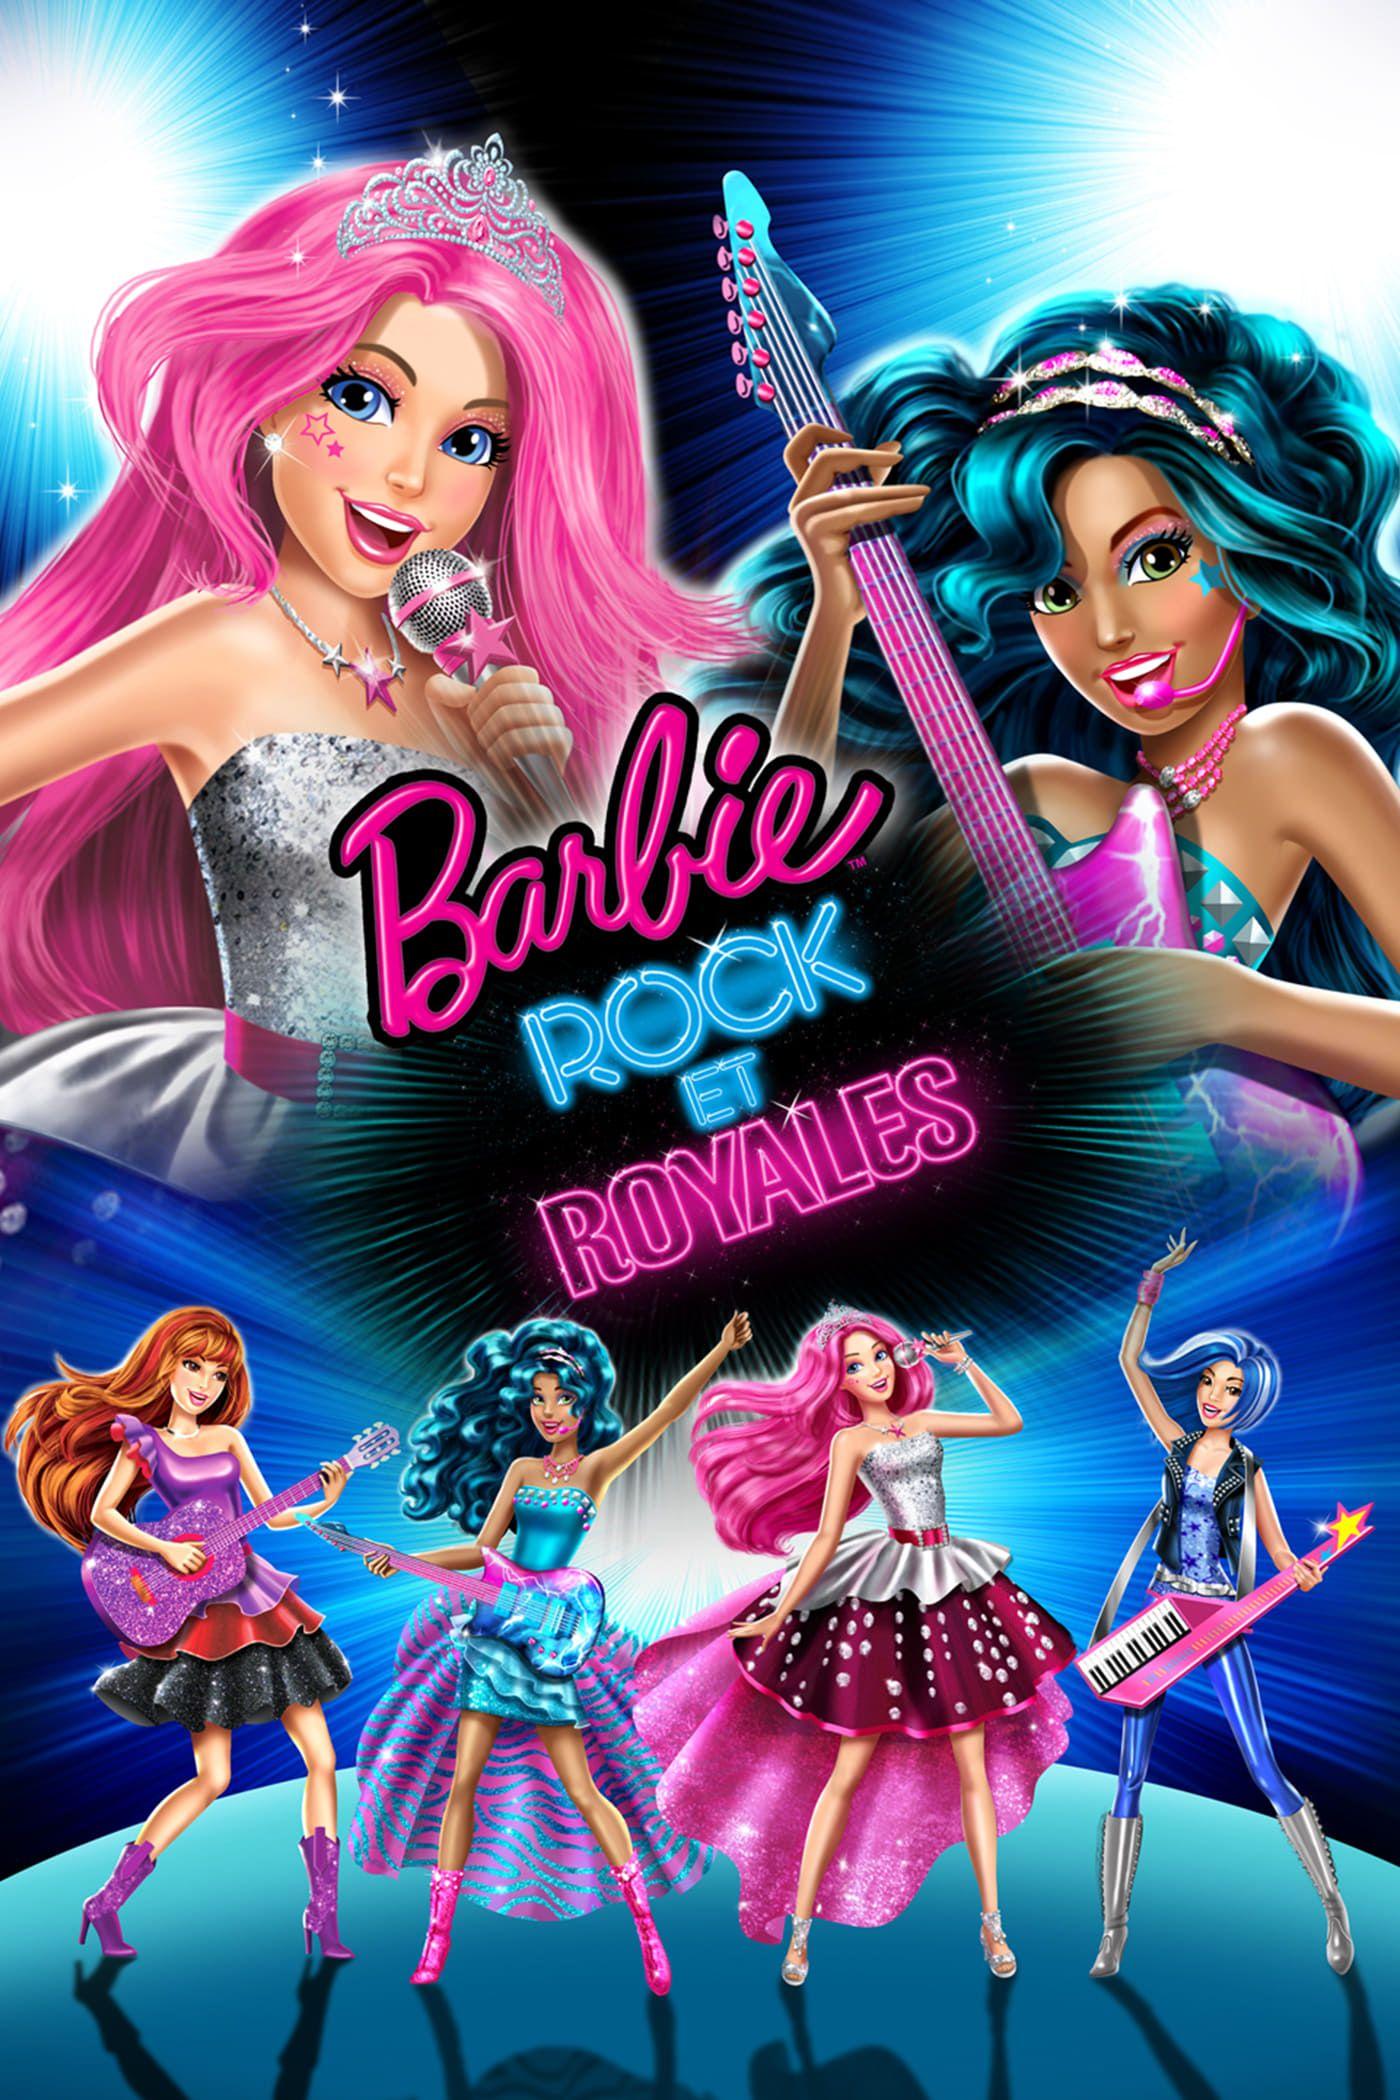 Voir Barbie Rock Et Royales 2015 En Streaming Vf Hd Barbie Prinzessin Filme Stream